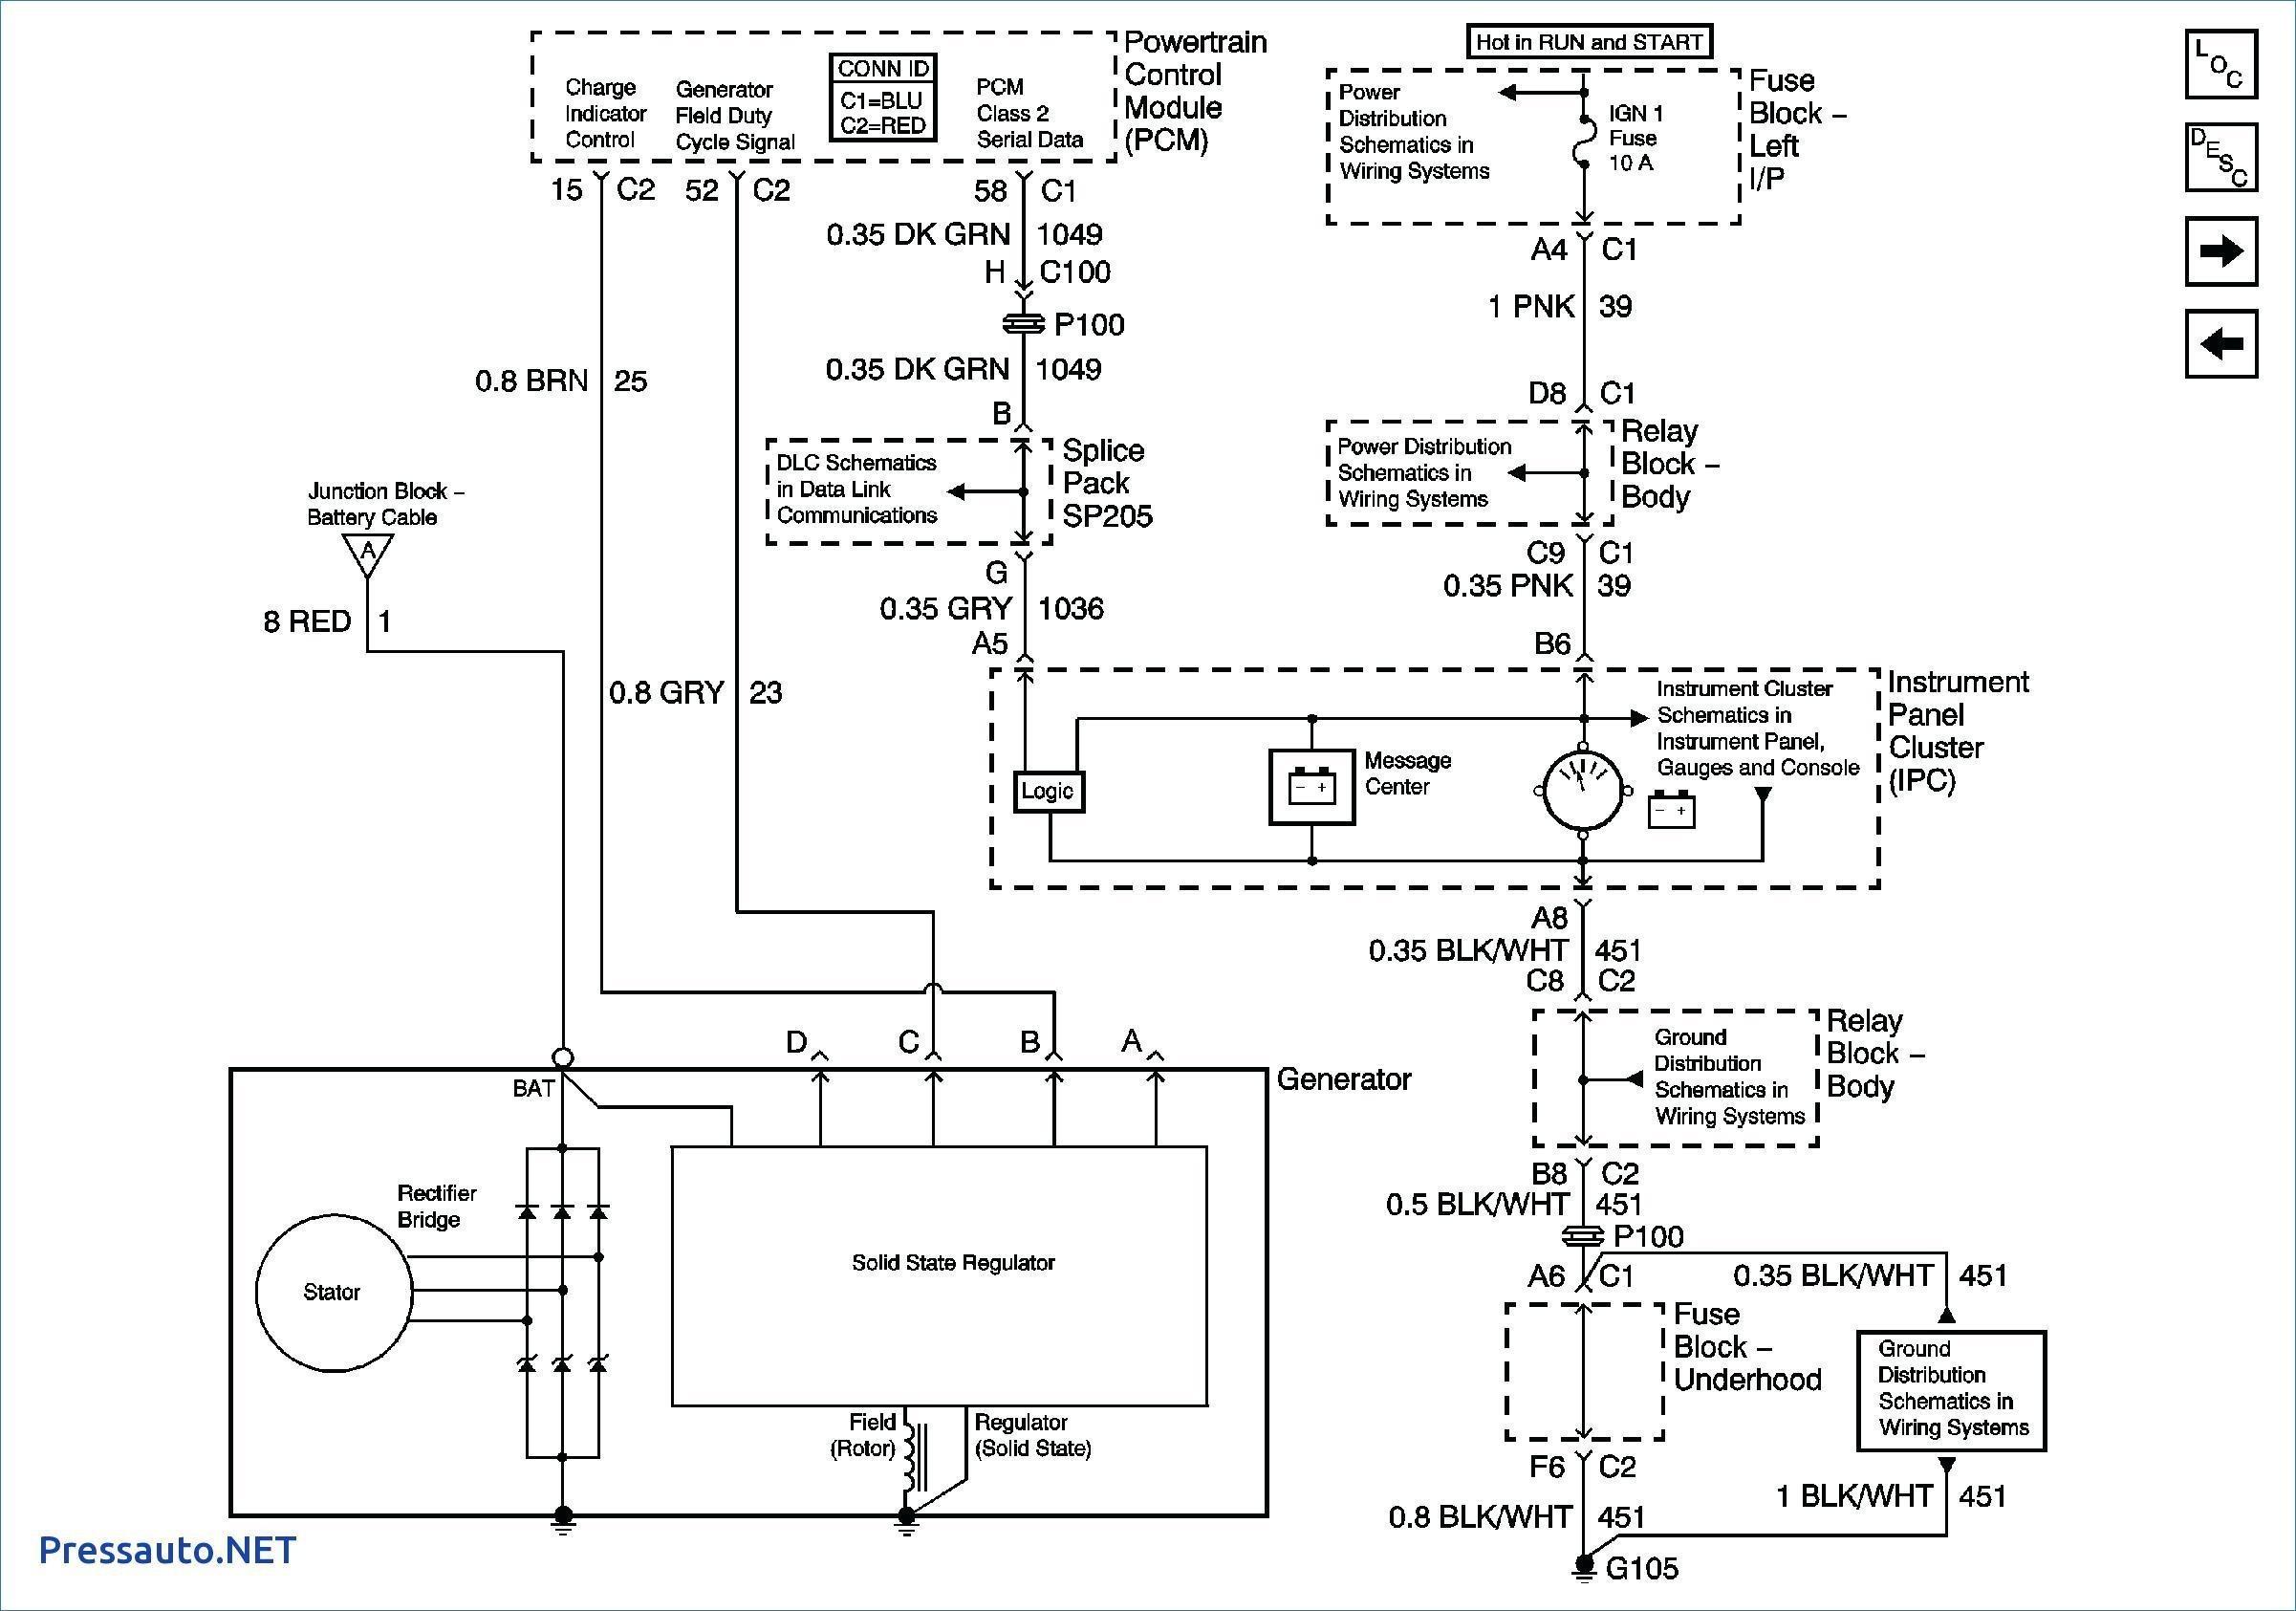 Engineering Diagram Symbols Wiring Diagram Symbols Fresh Used Relay Symbols • Electrical Outlet Of Engineering Diagram Symbols